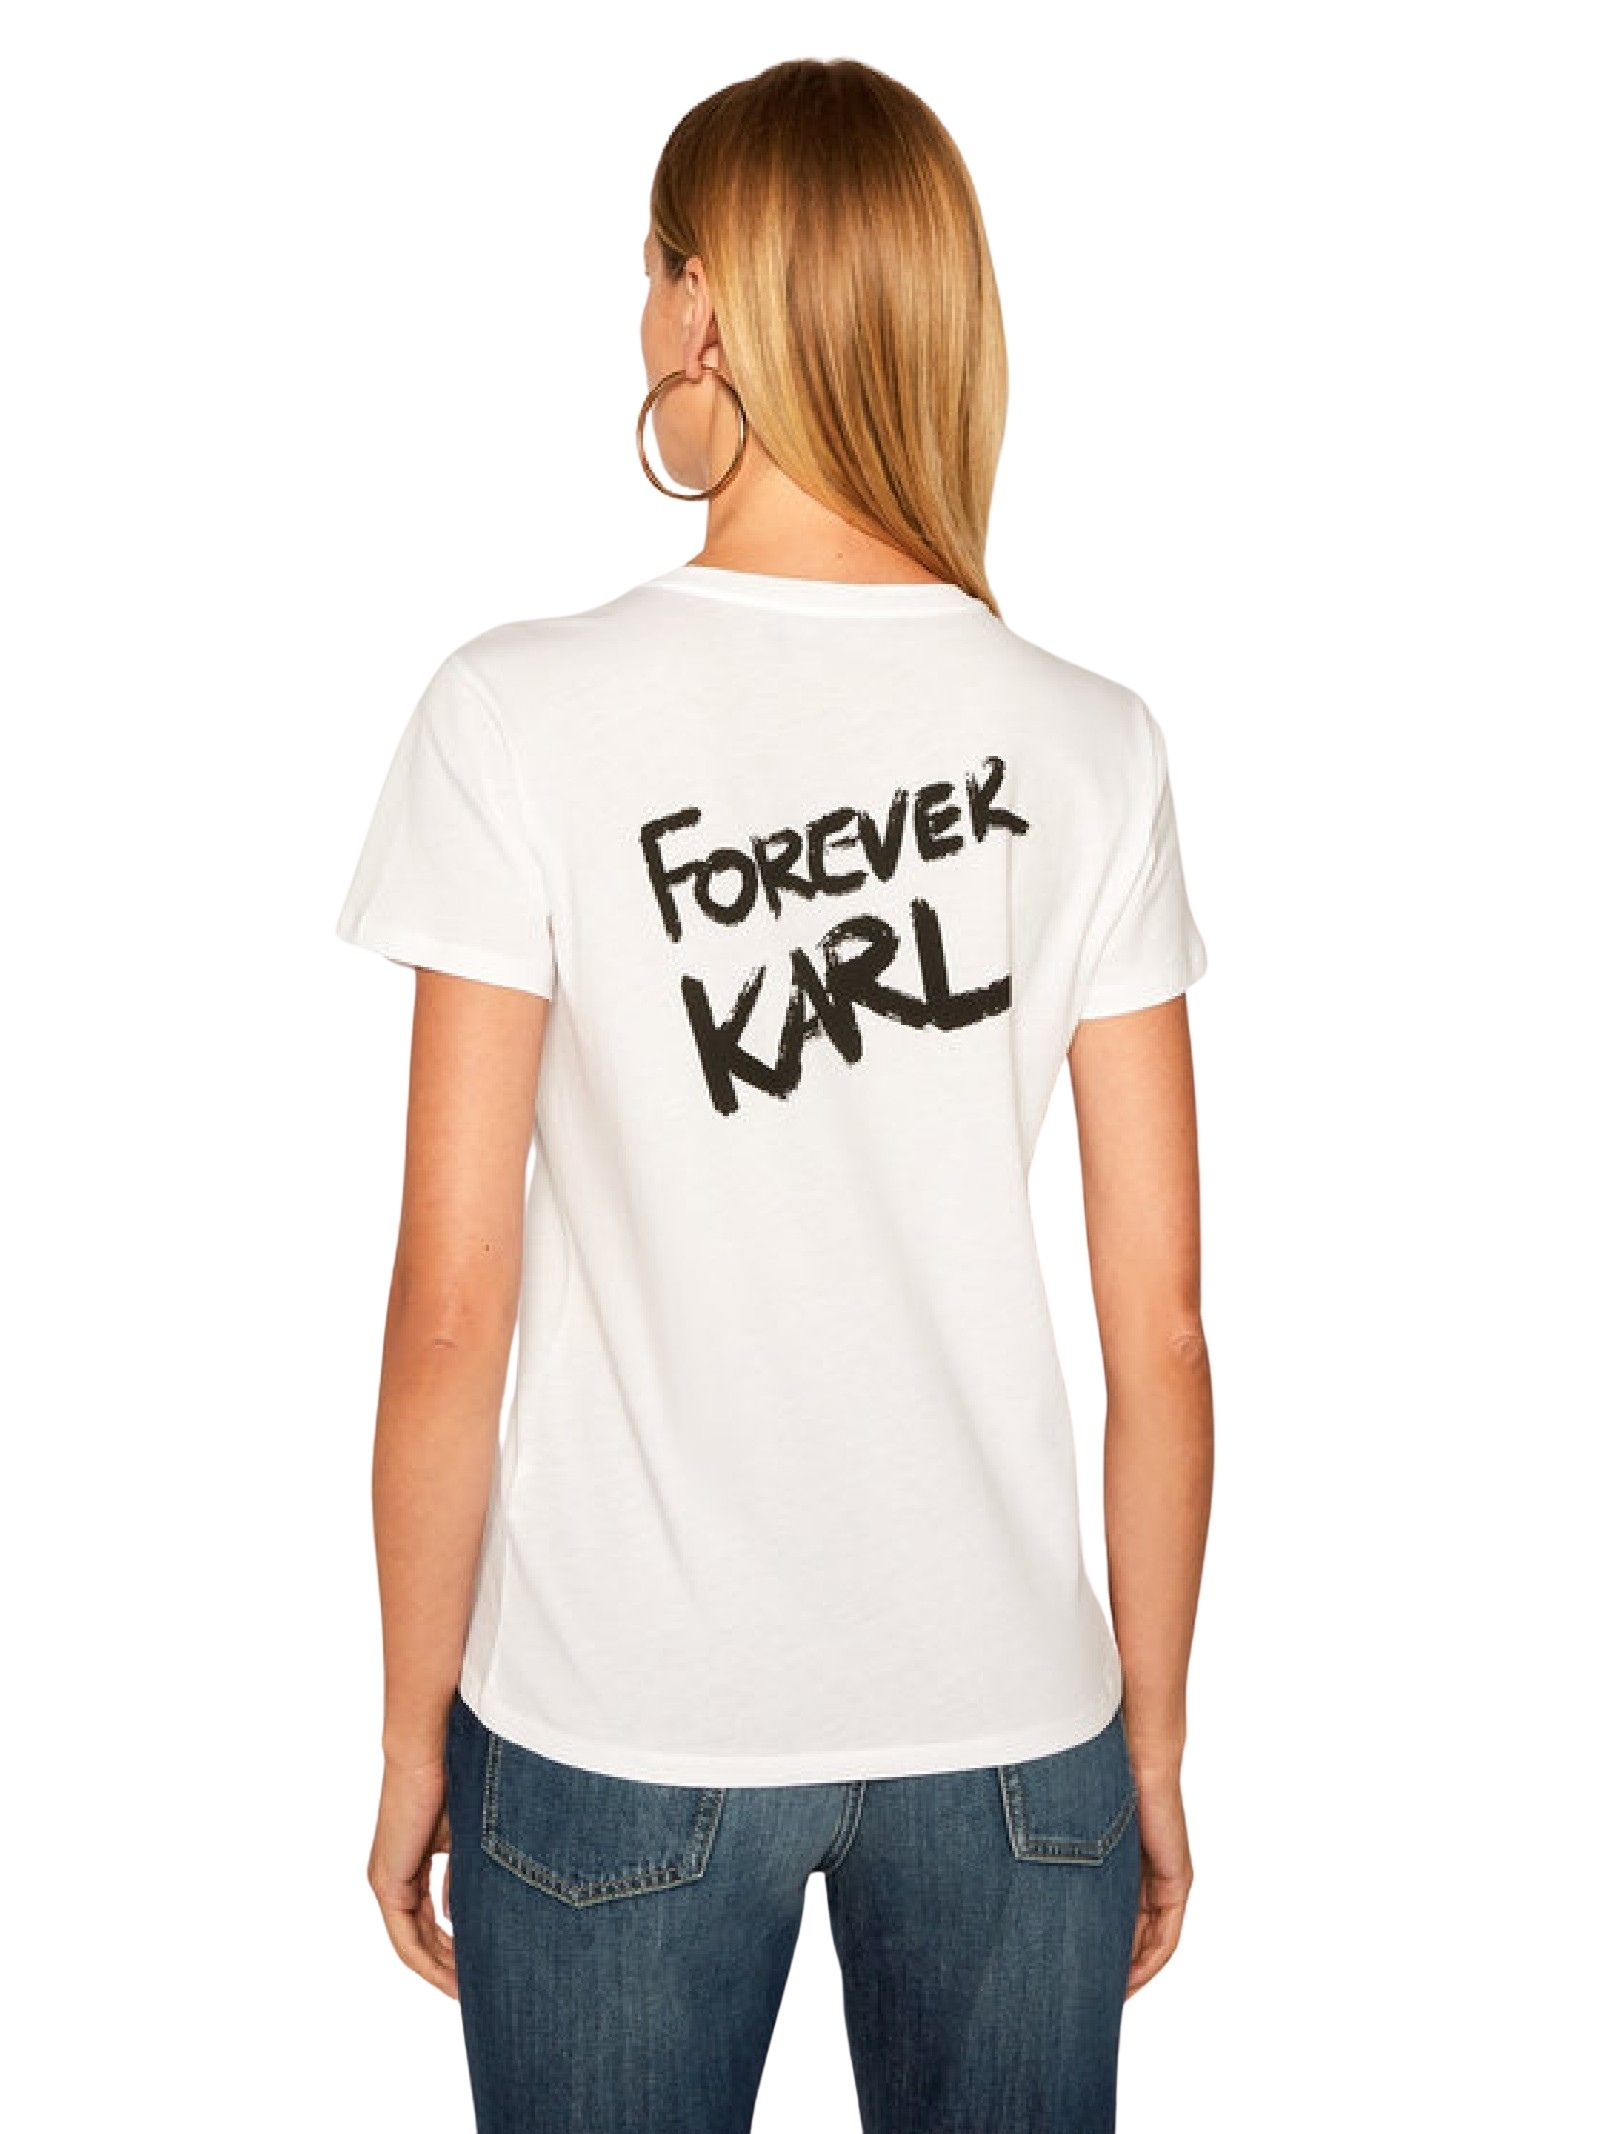 Forever Karl T-Shirt  bianca KARL LAGERFELD   T-shirt   205W1702.21100